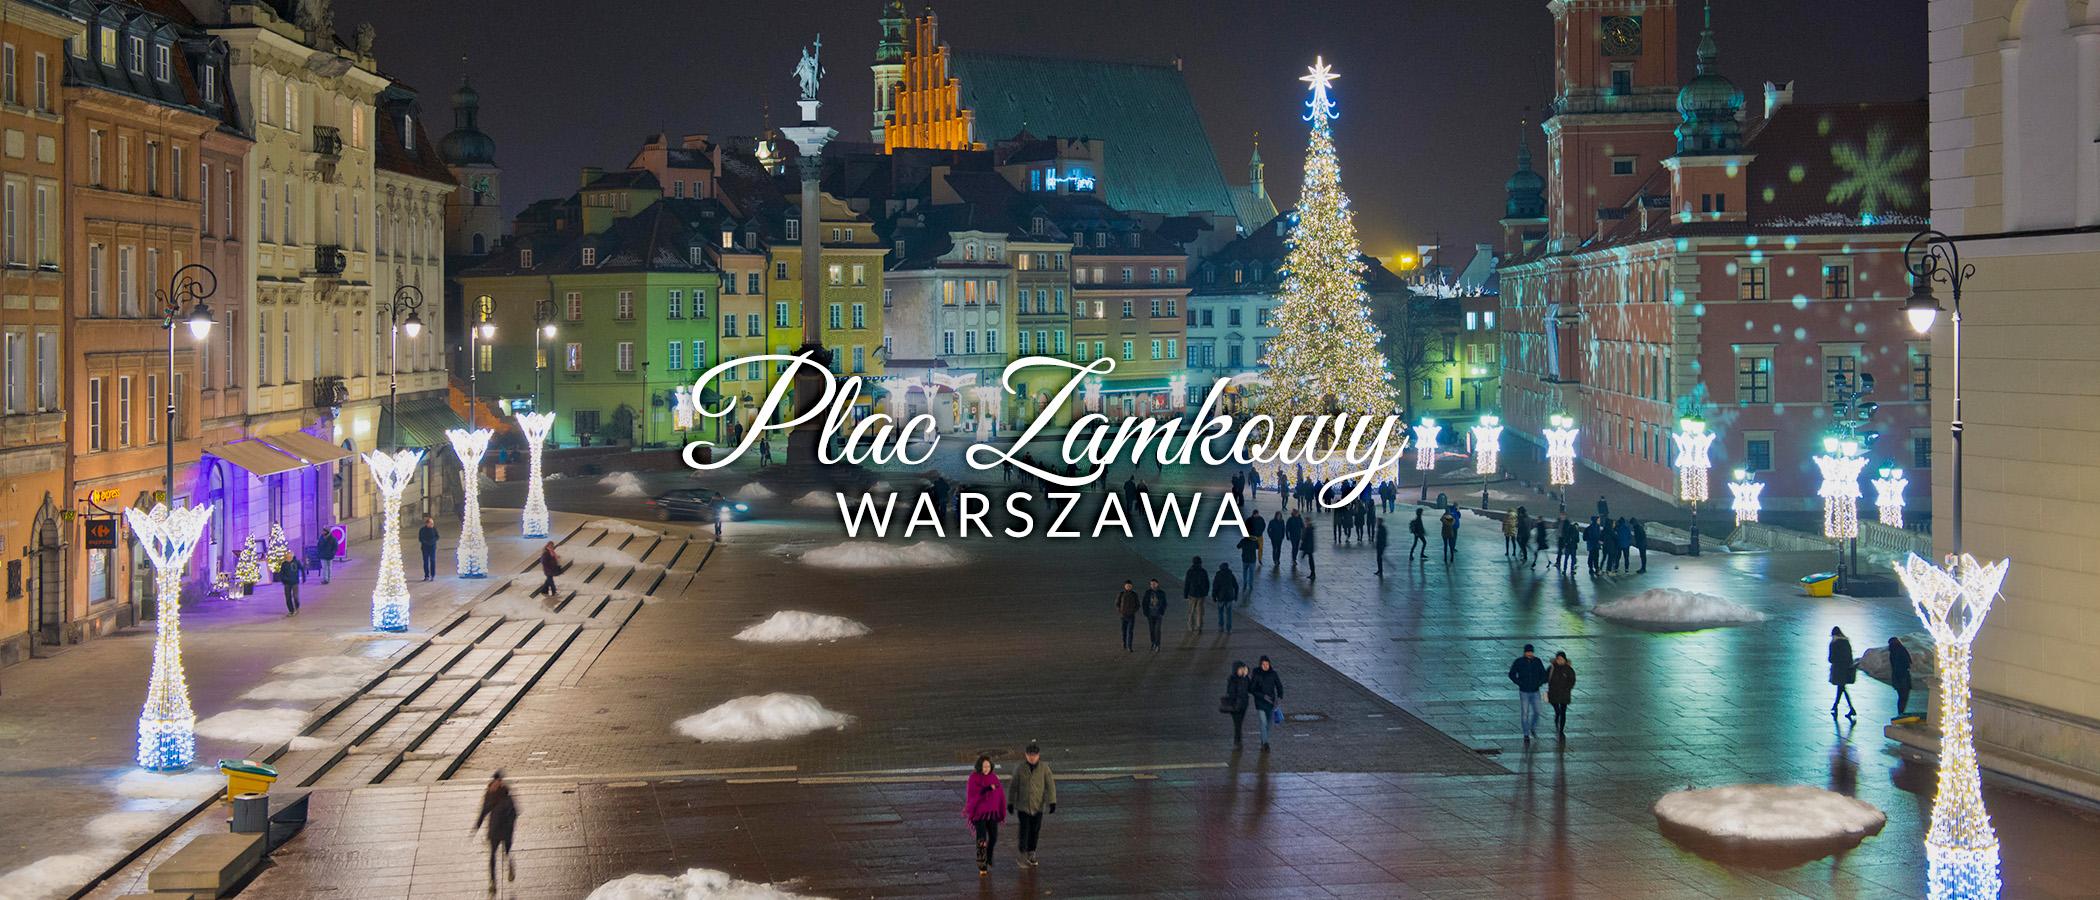 warszawa_pl